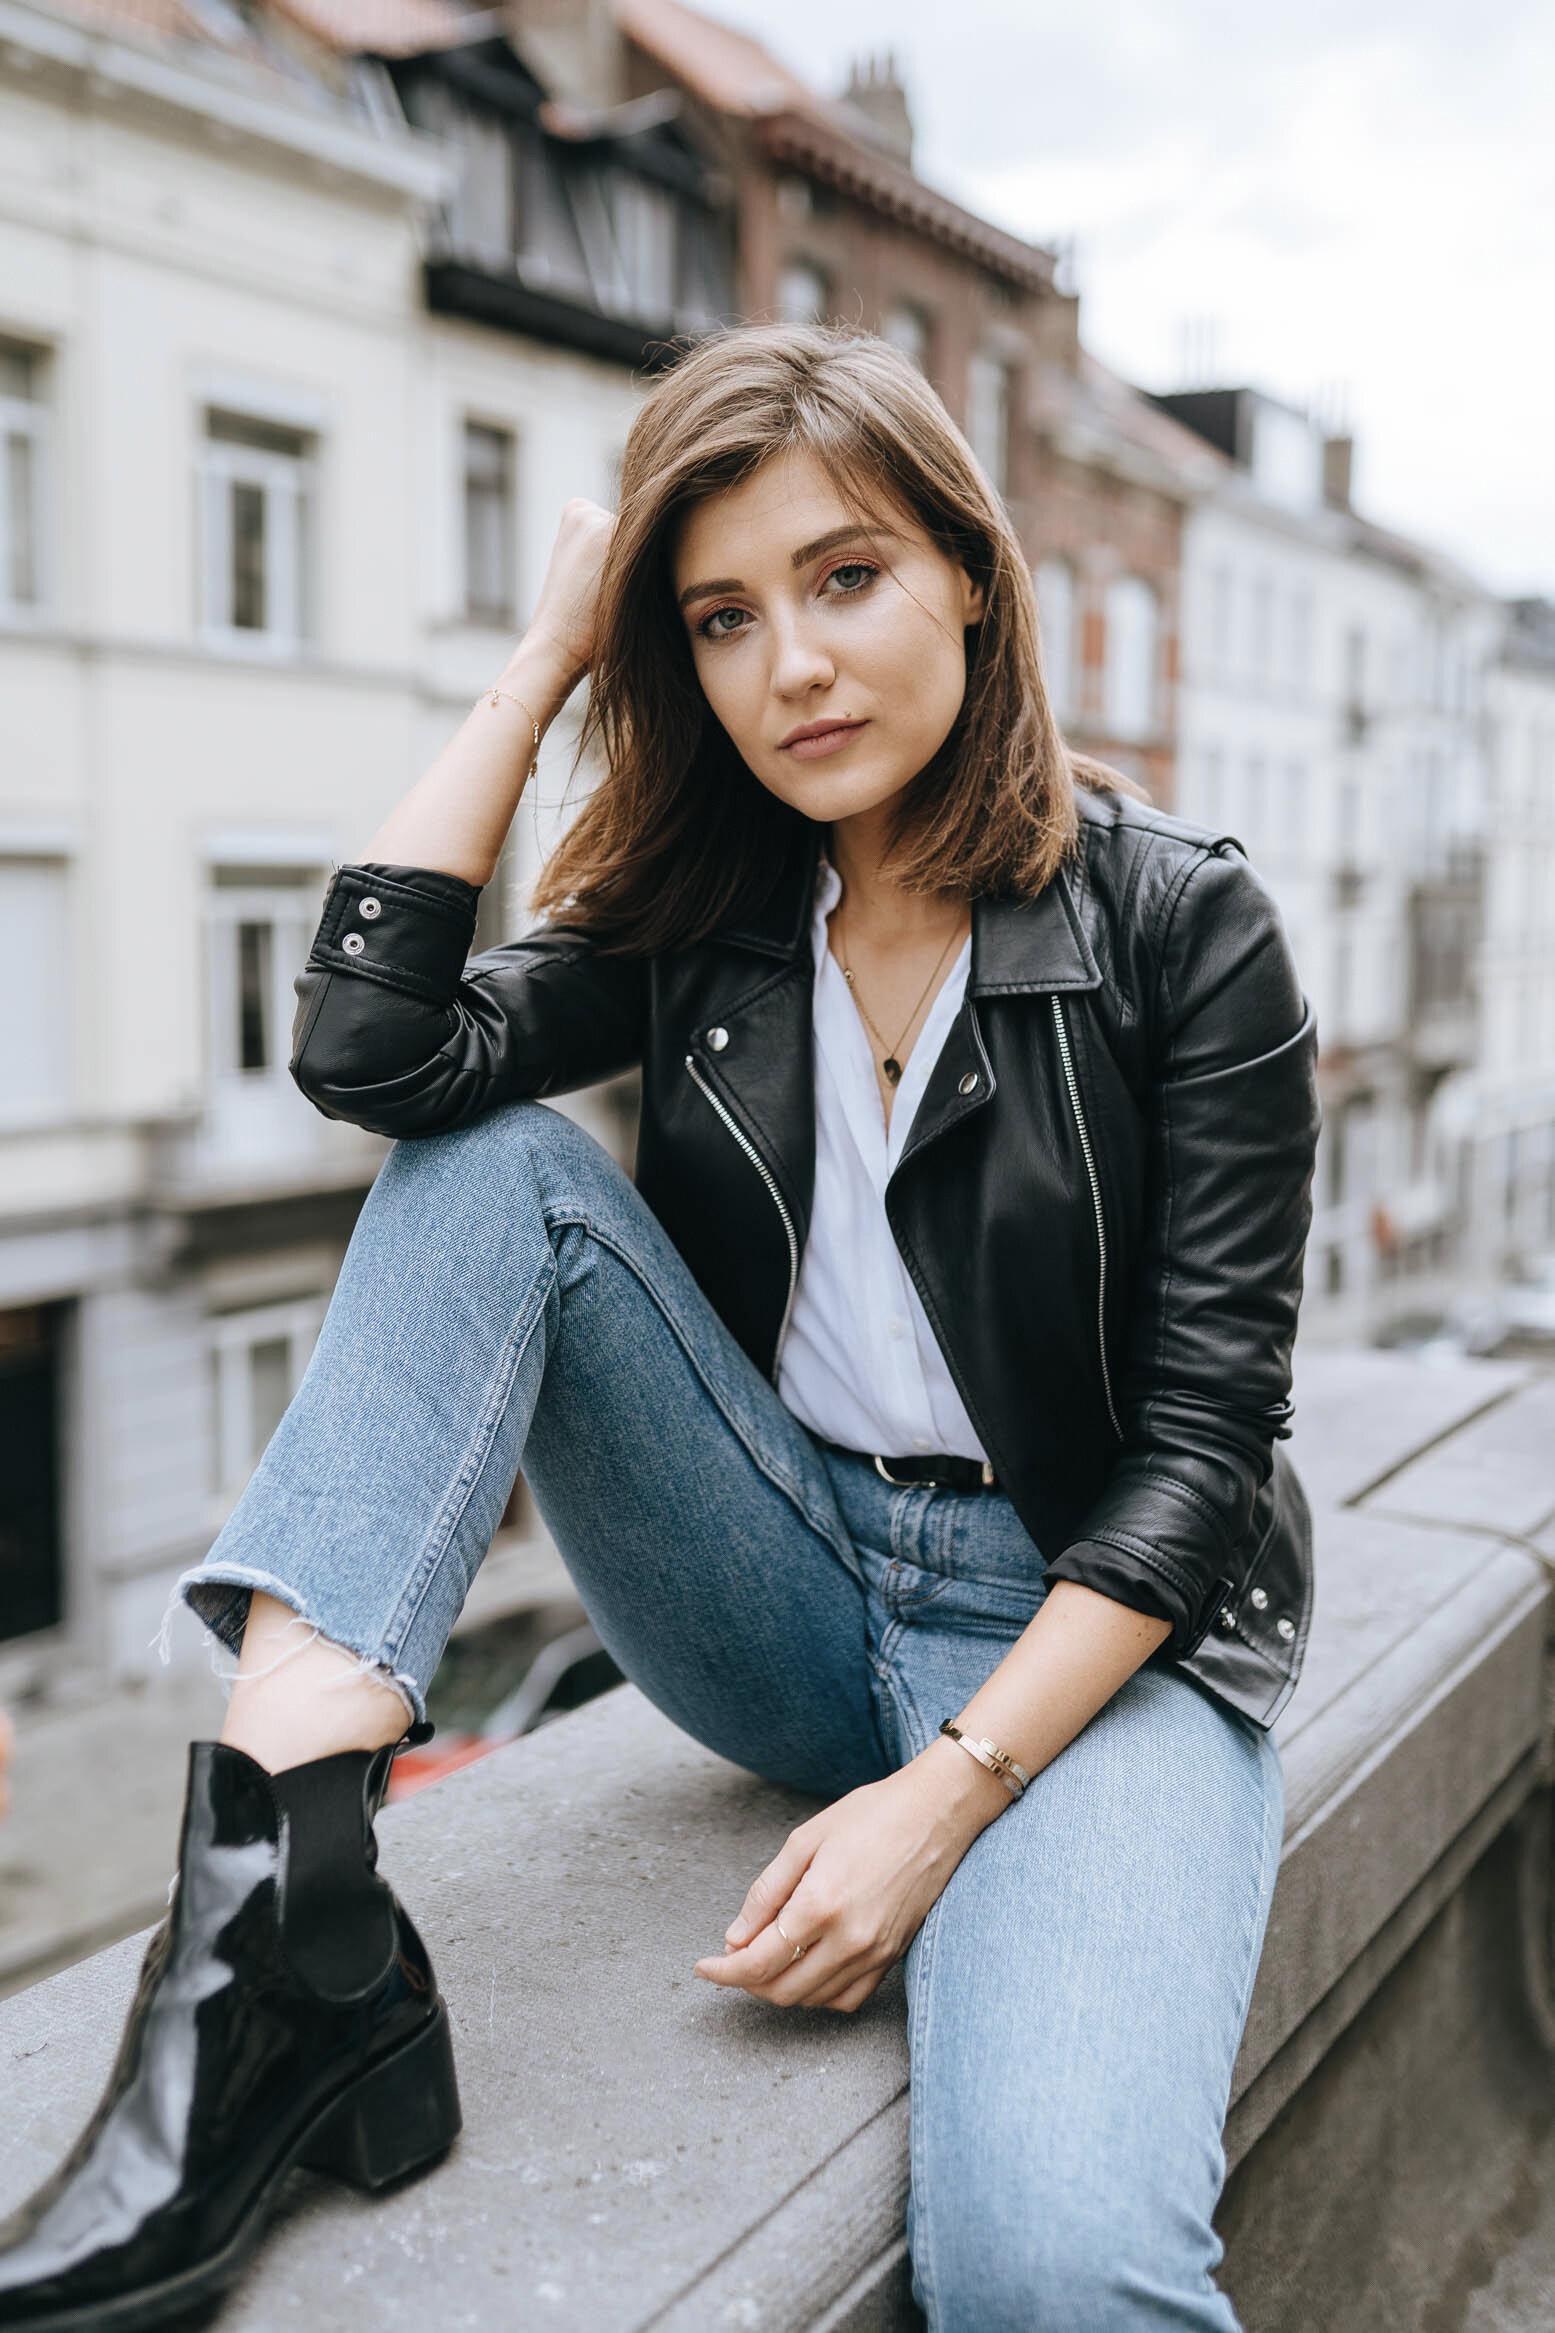 photographe-bruxelles-portrait-femme-nicolasleleu-20.jpg